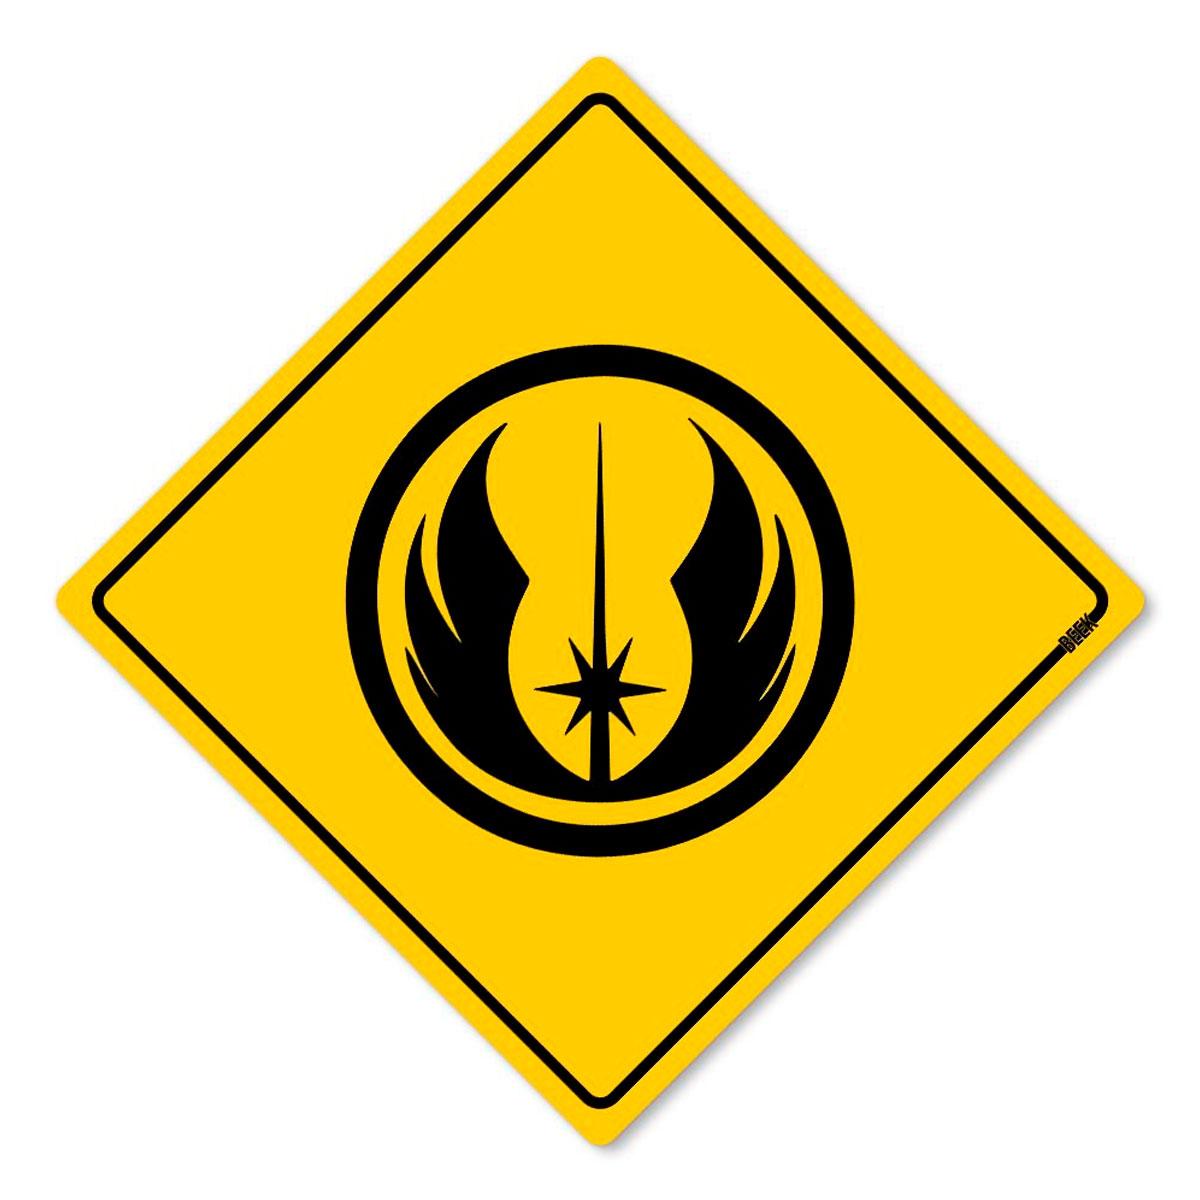 Placa Decorativa 30x30 Sinalização Jedi Star Wars - Presente Super